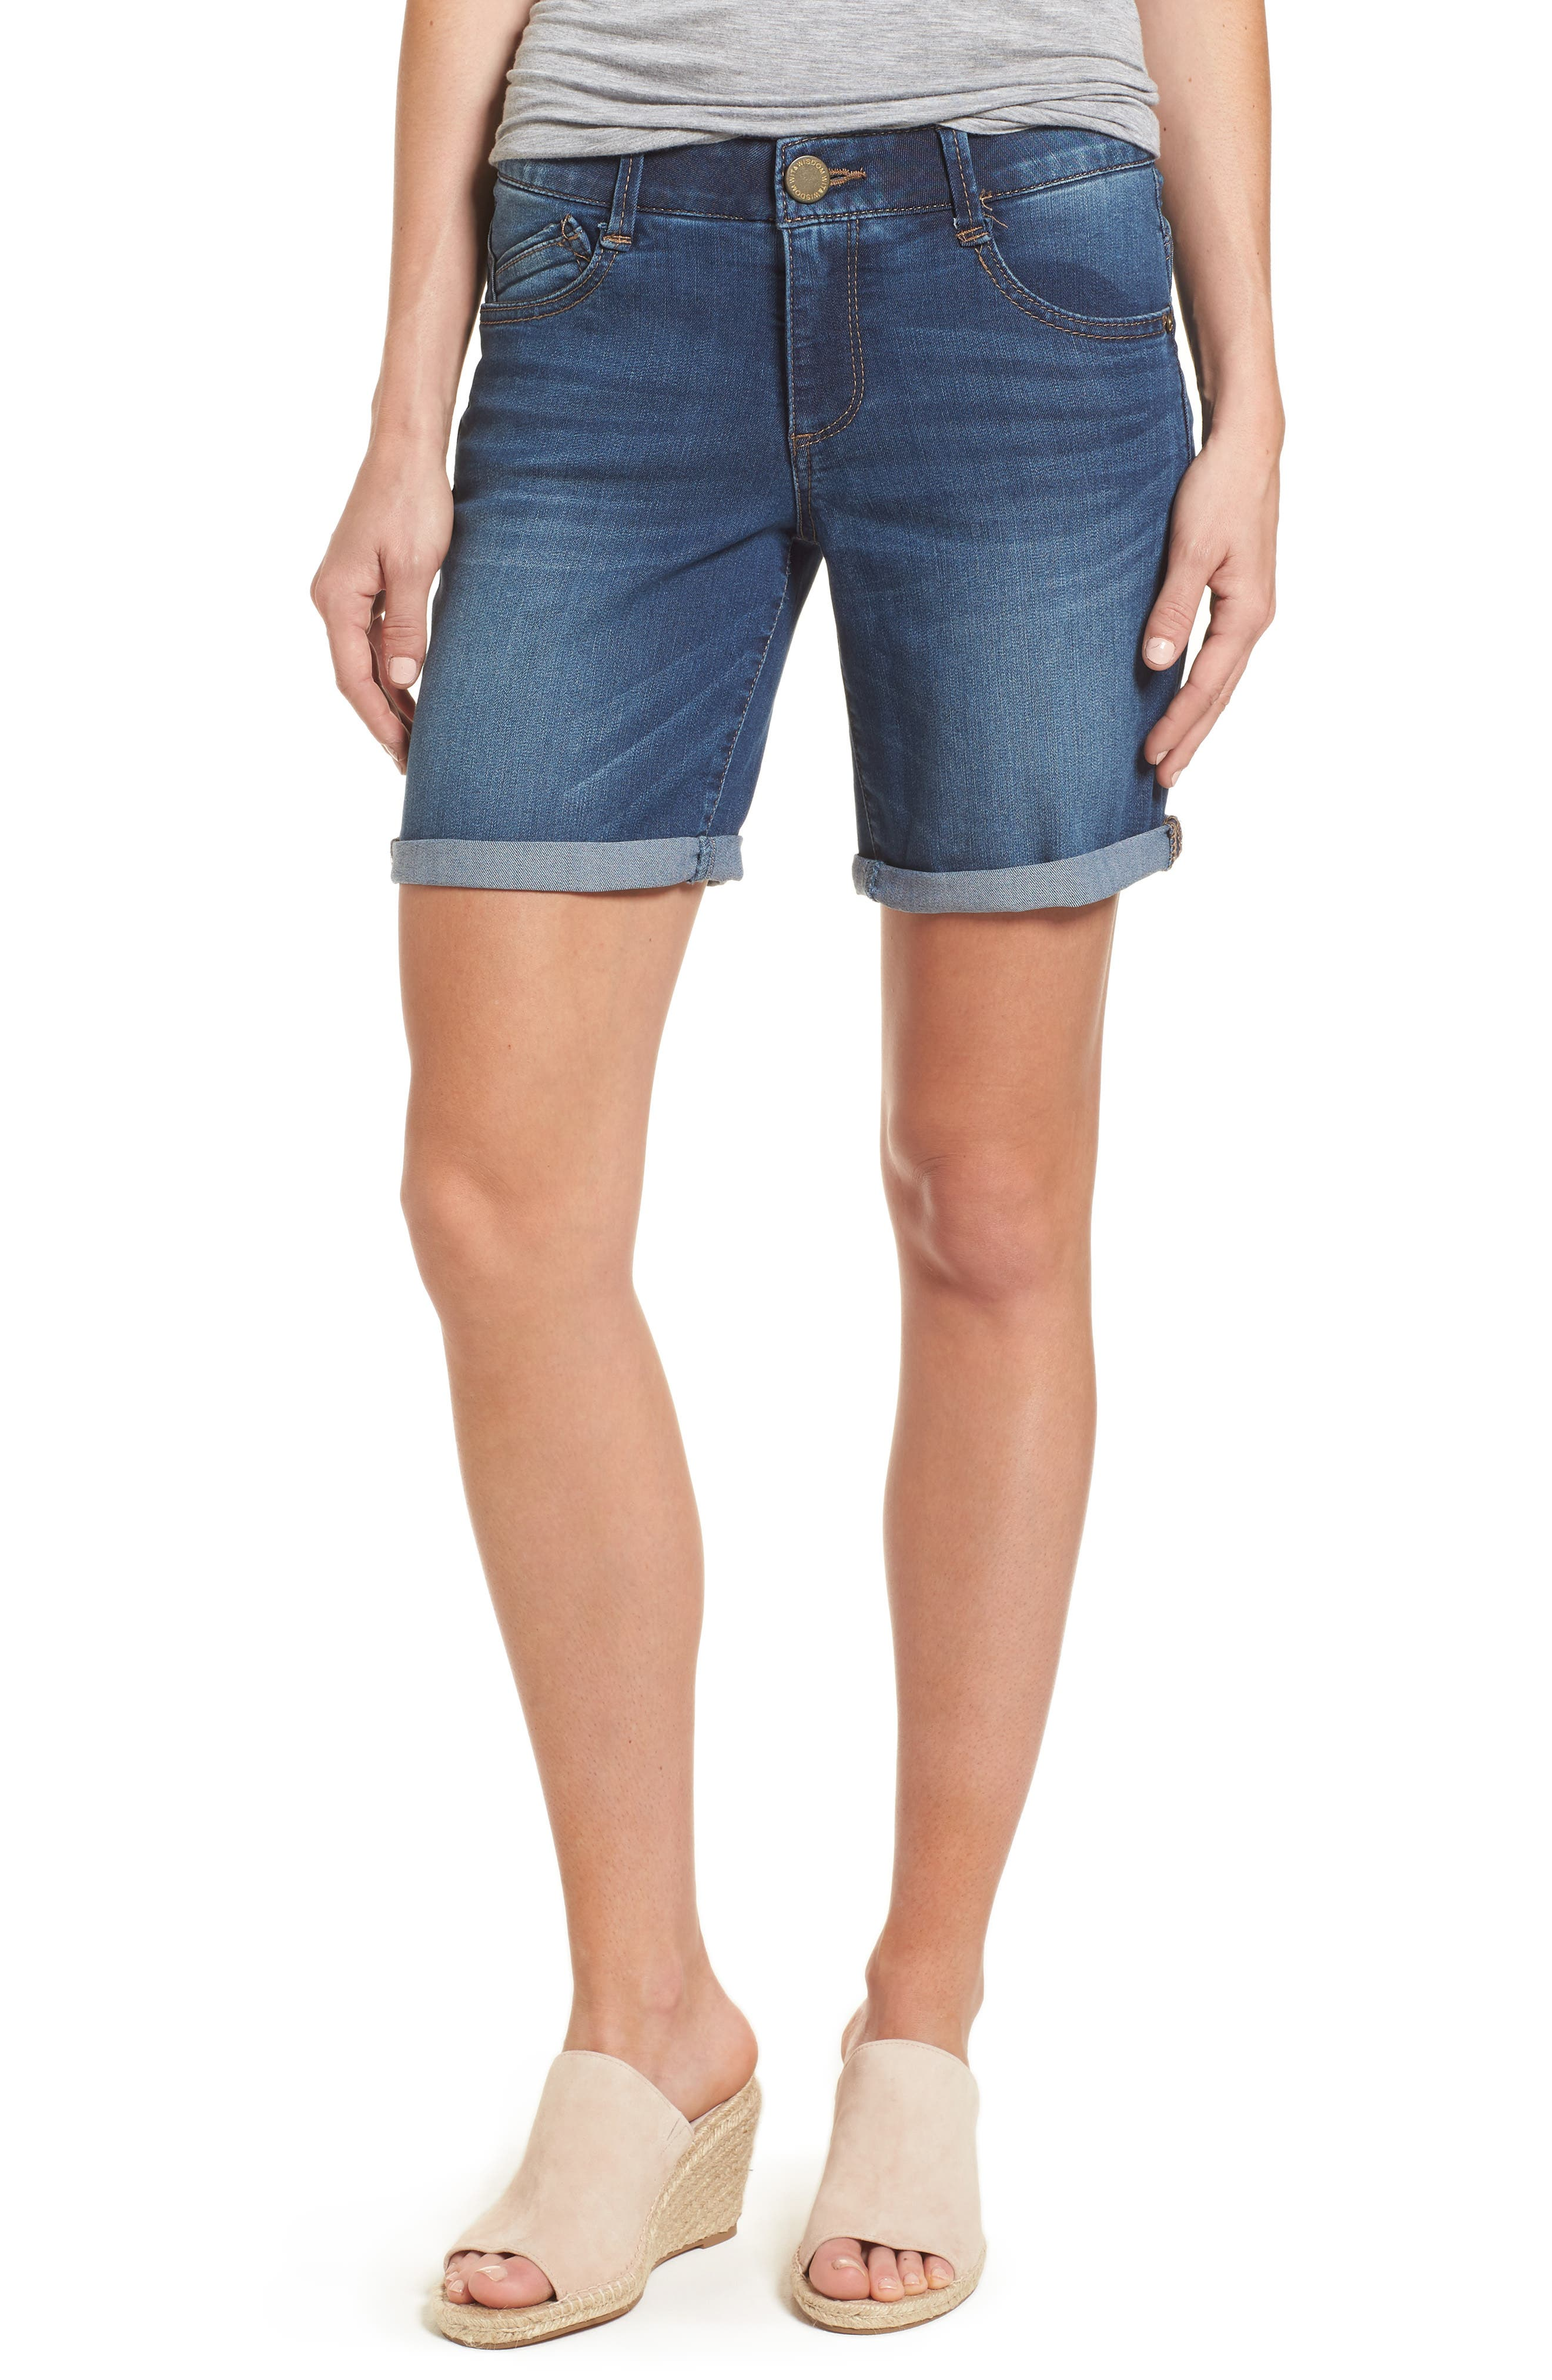 Ab-solution Cuffed Denim Shorts,                             Main thumbnail 1, color,                             420